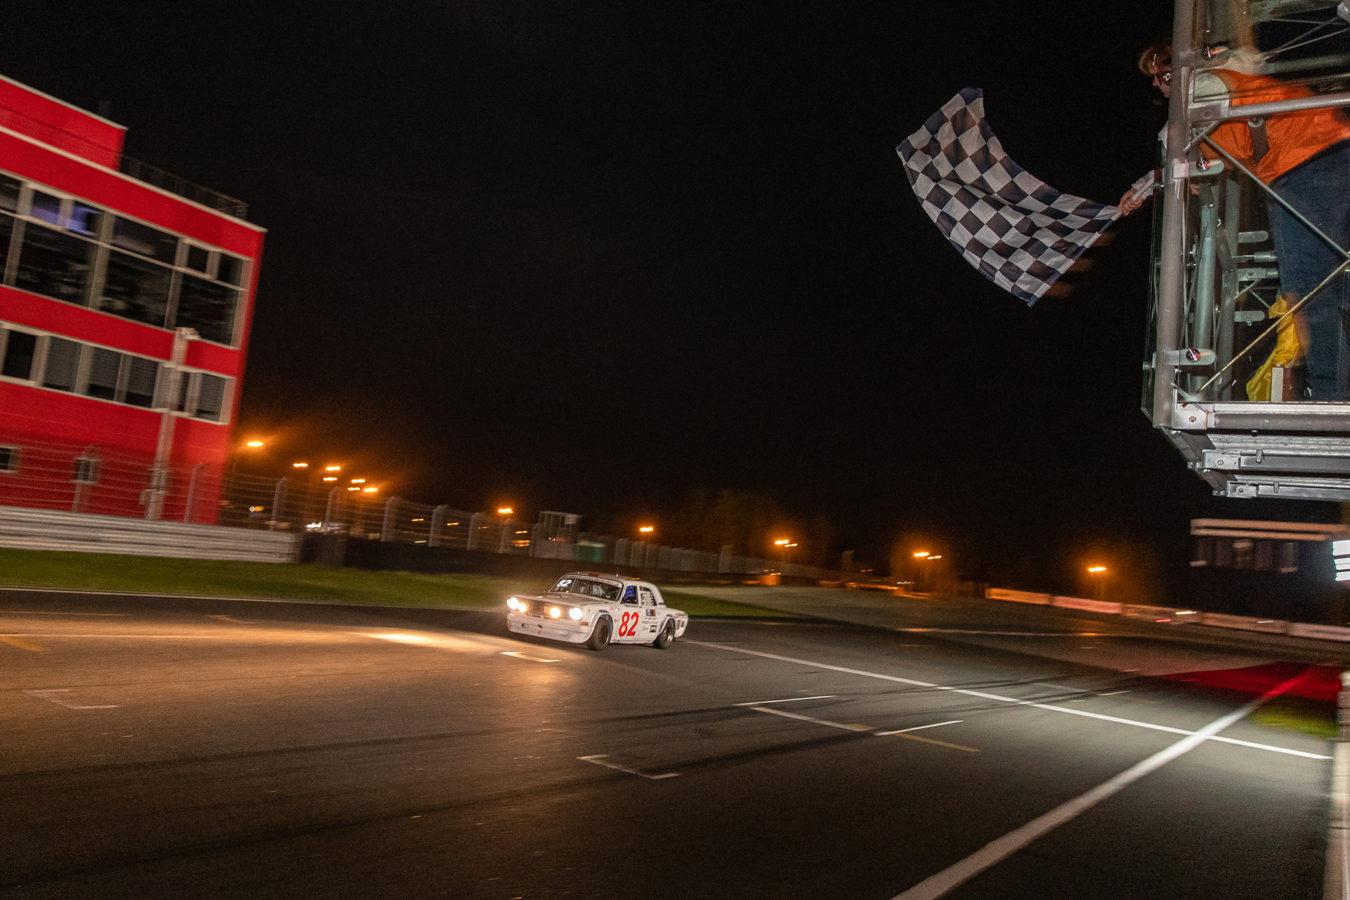 Moscow Classic Grand Prix - Длинная гонка 24 часа 2021